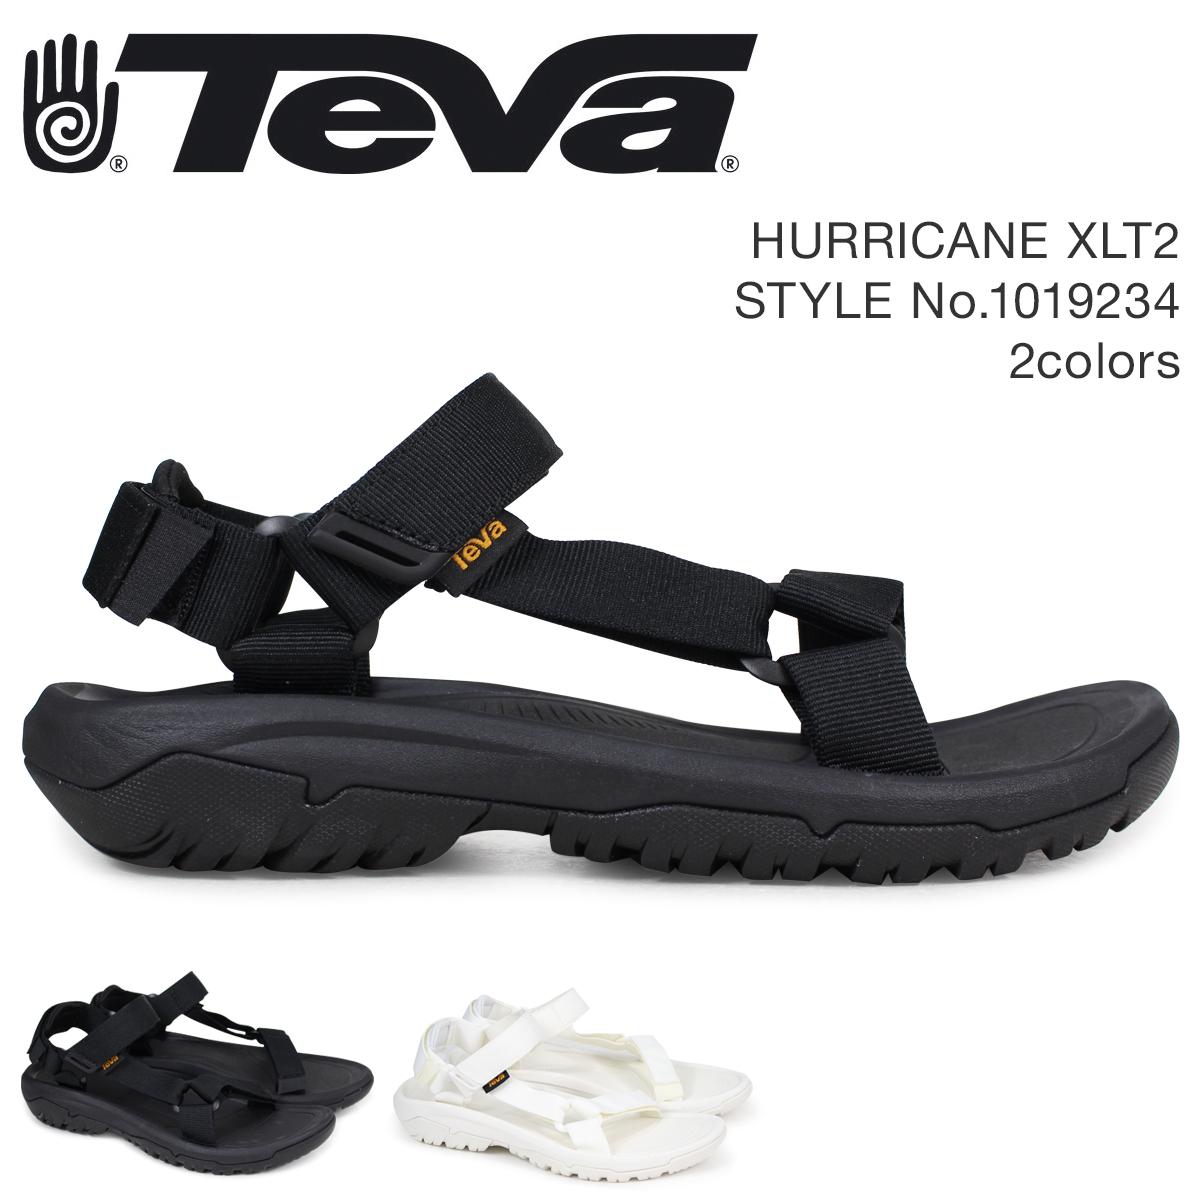 ba646d28bd71 Teva Teva sandals men hurricane XLT2 HURRICANE black white 1019234  4 18  Shinnyu load